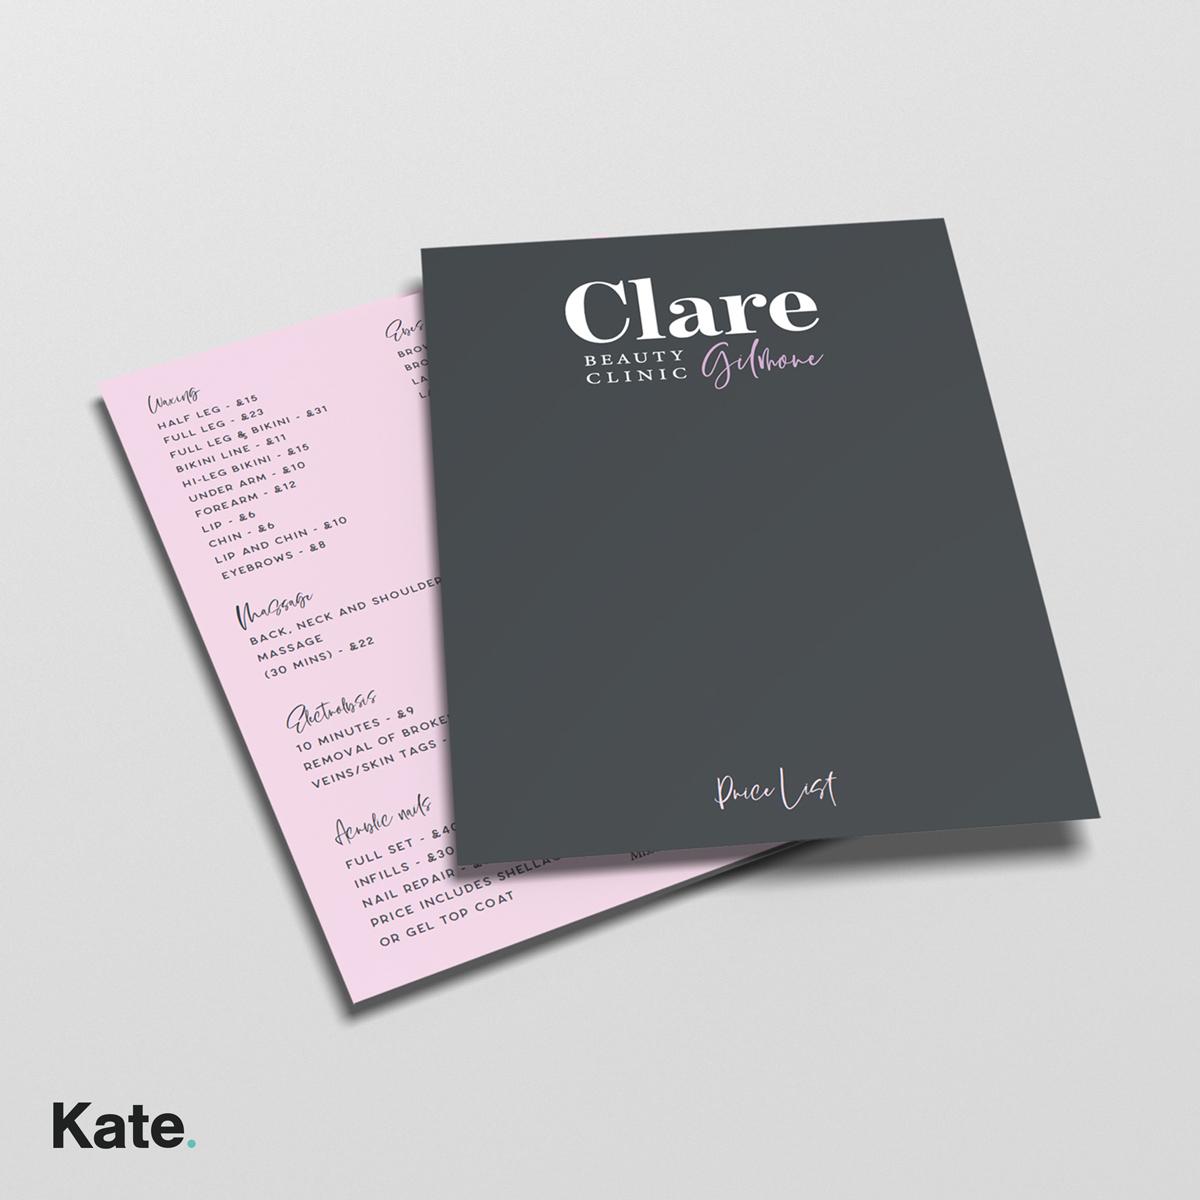 Clare Gilmore Price list